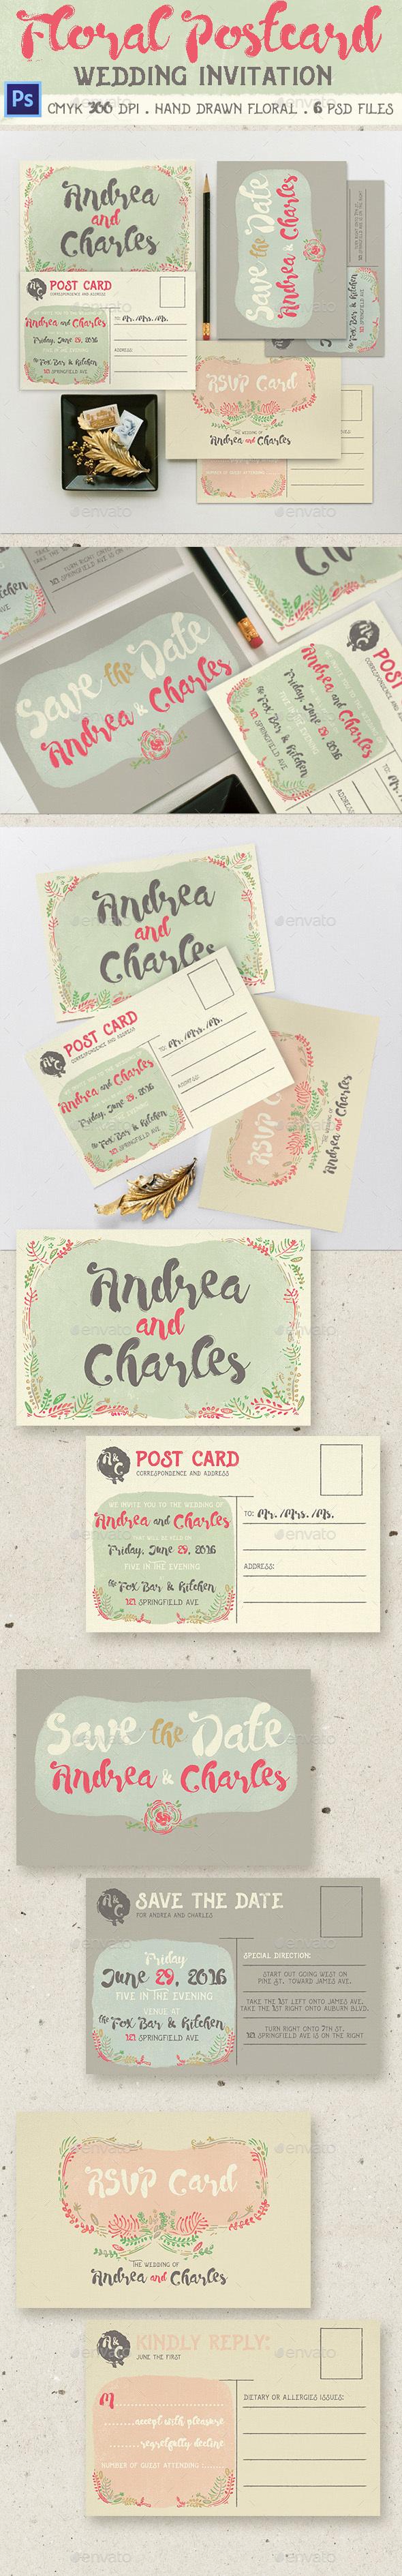 Floral Postcard Wedding Invitation - Weddings Cards & Invites